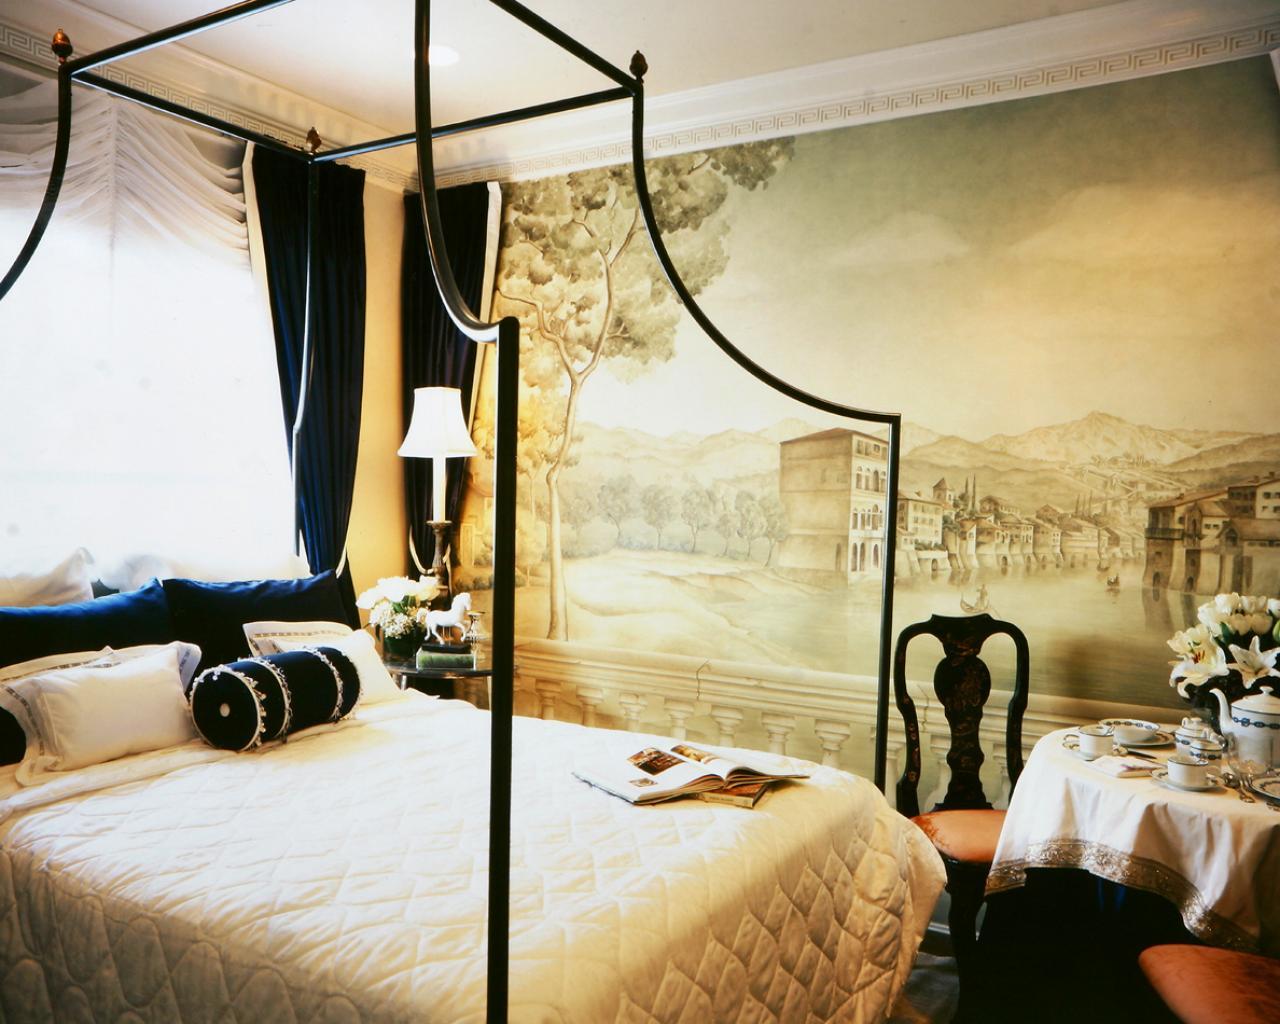 Bedroom Design Donts HGTV 1280x1024